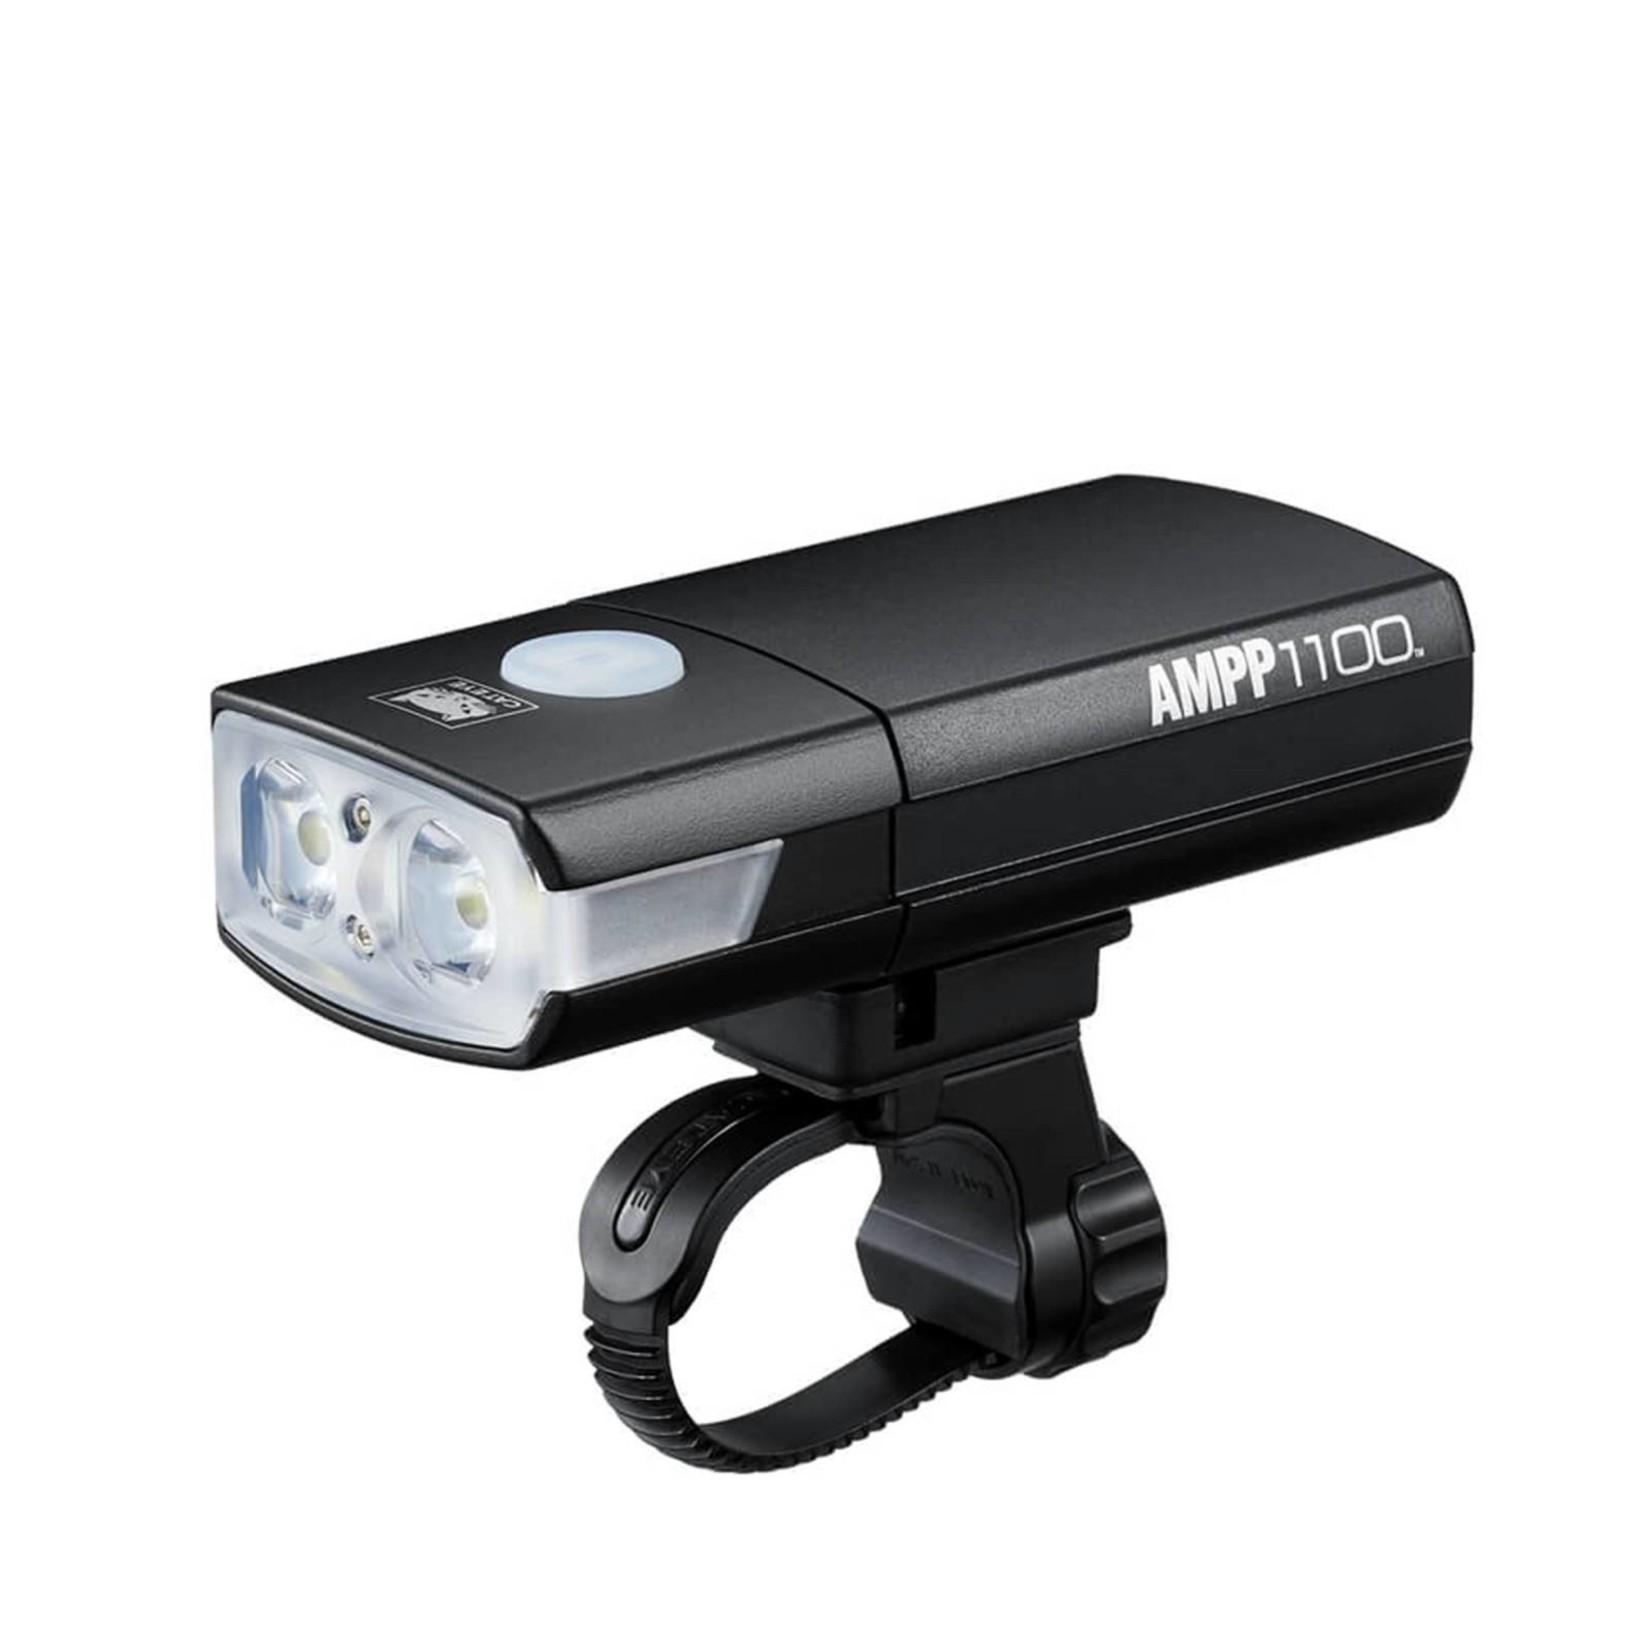 Cateye AMPP1100 Front Light